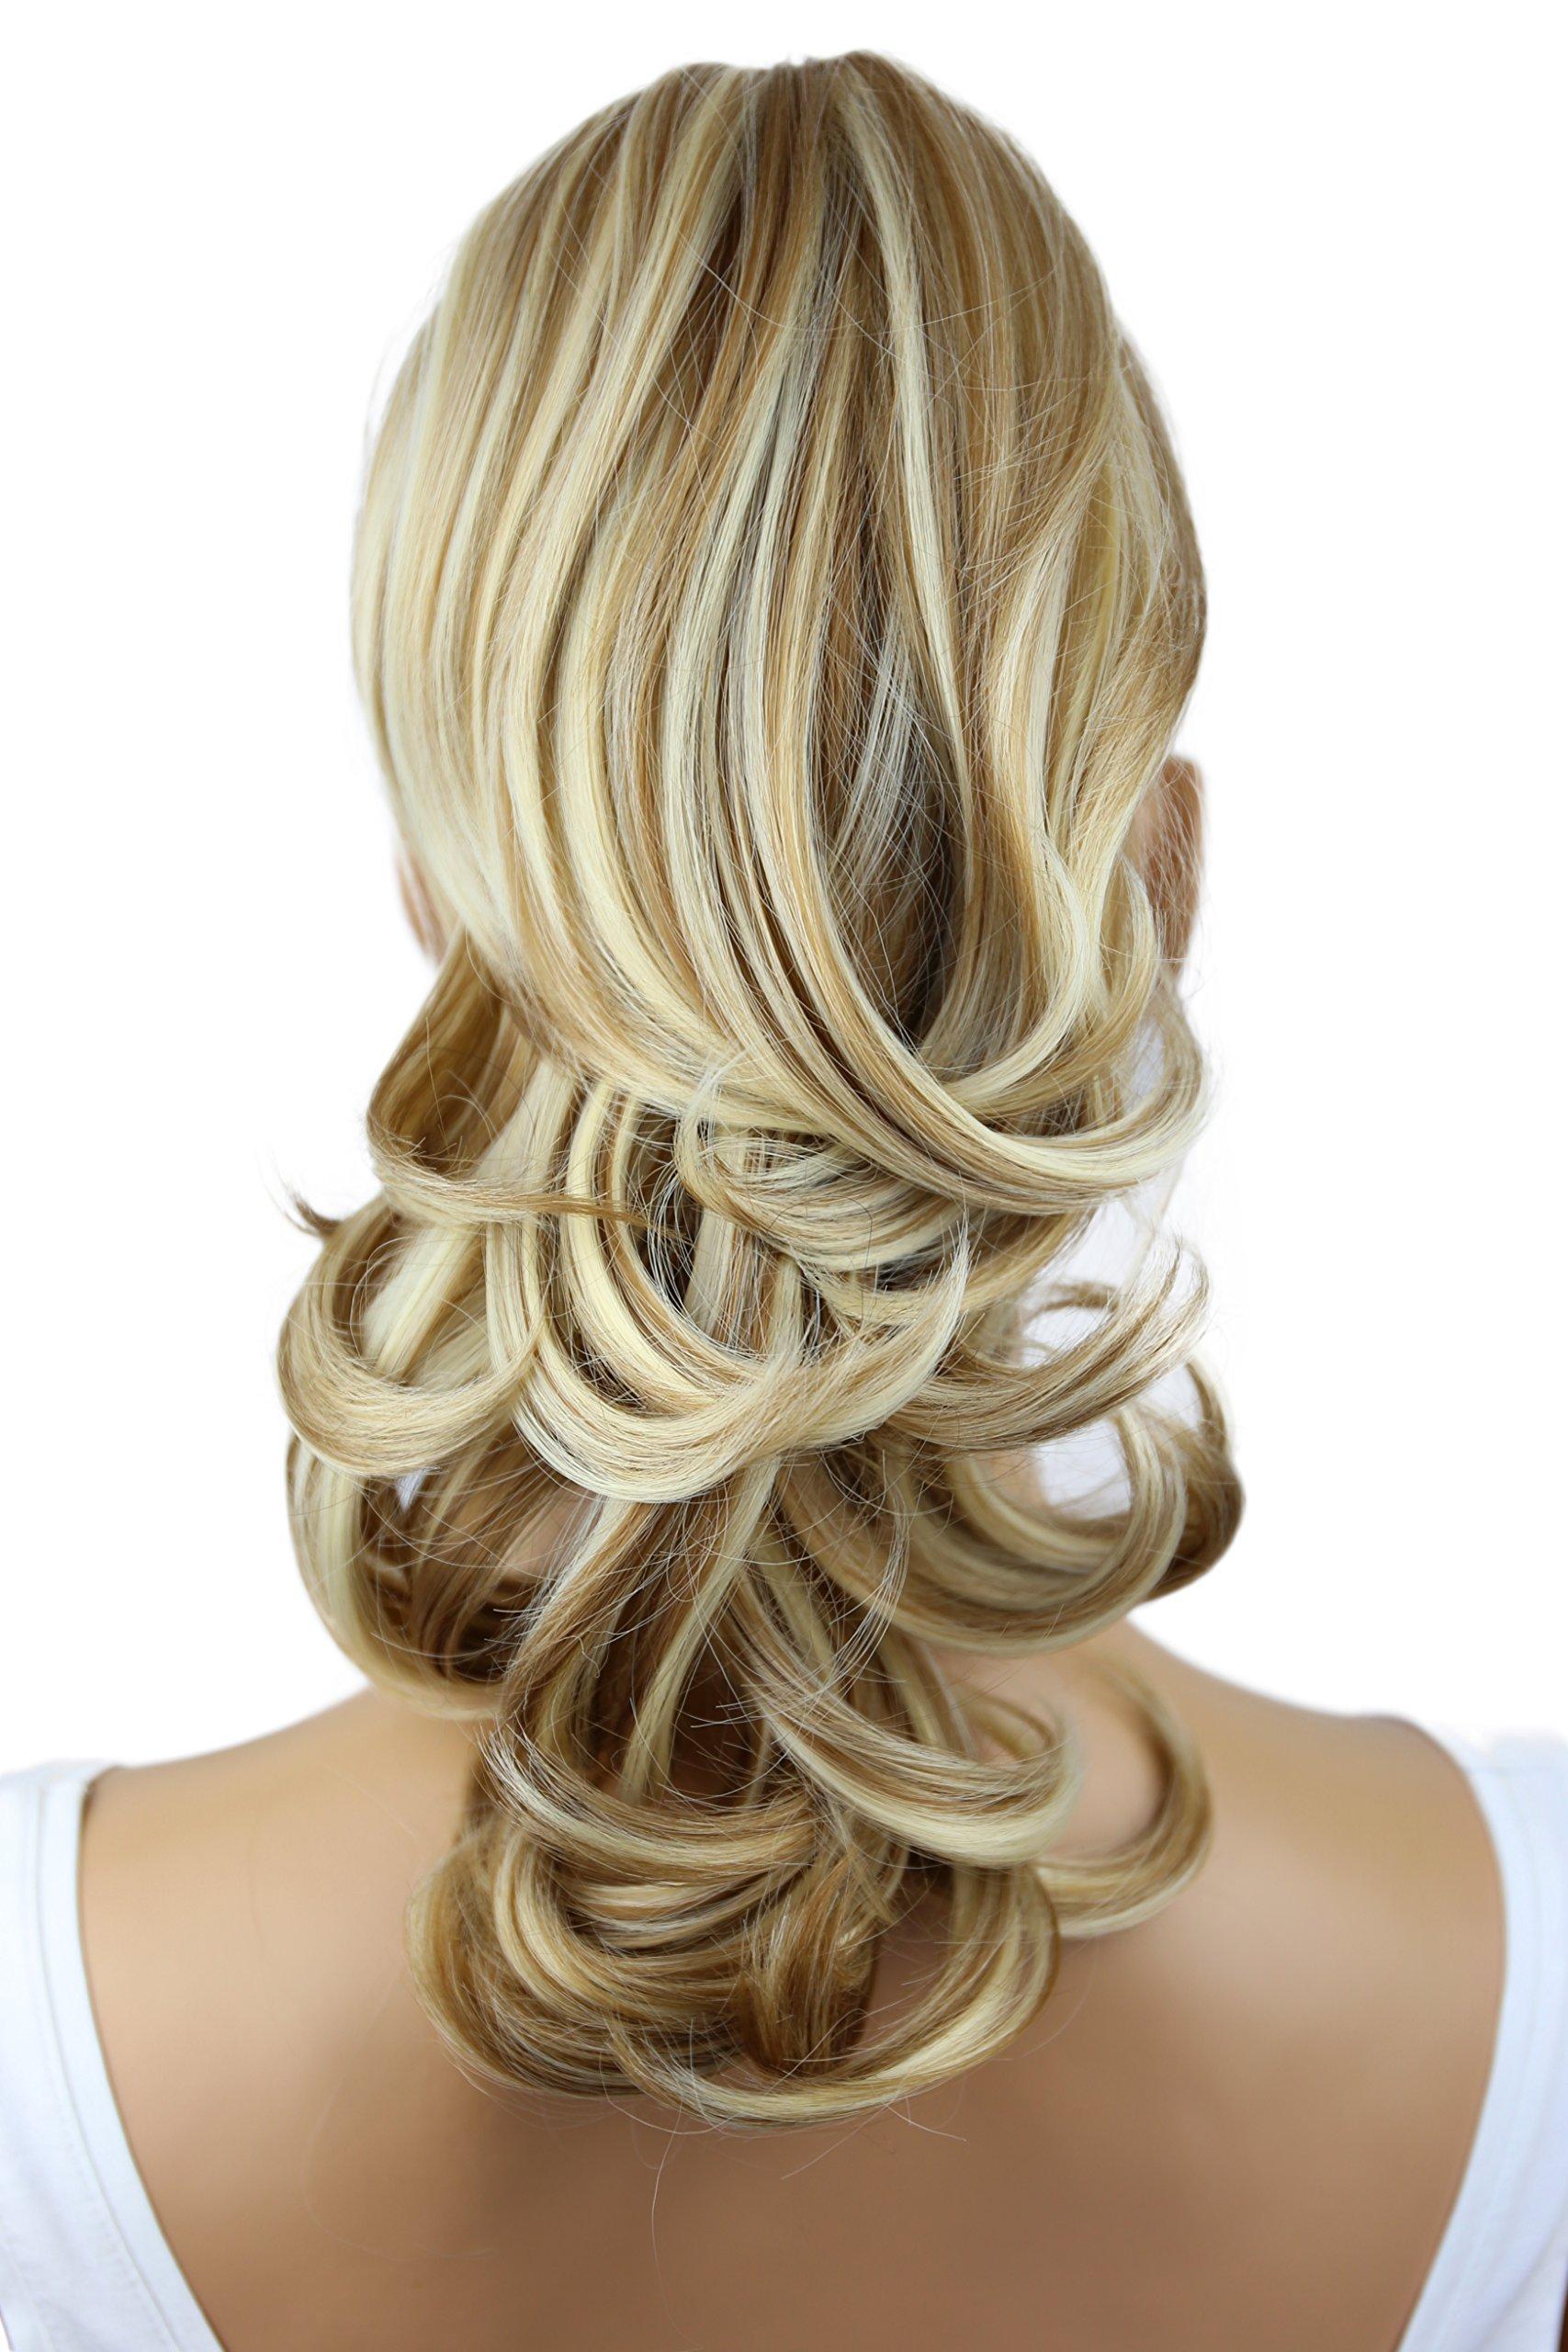 PRETTYSHOP 14'' Hair Piece Pony Tail Clip On Extension Voluminous Wavy Heat-Resisting Dark blonde mix # 27H613 H94 by Prettyshop Hairpiece